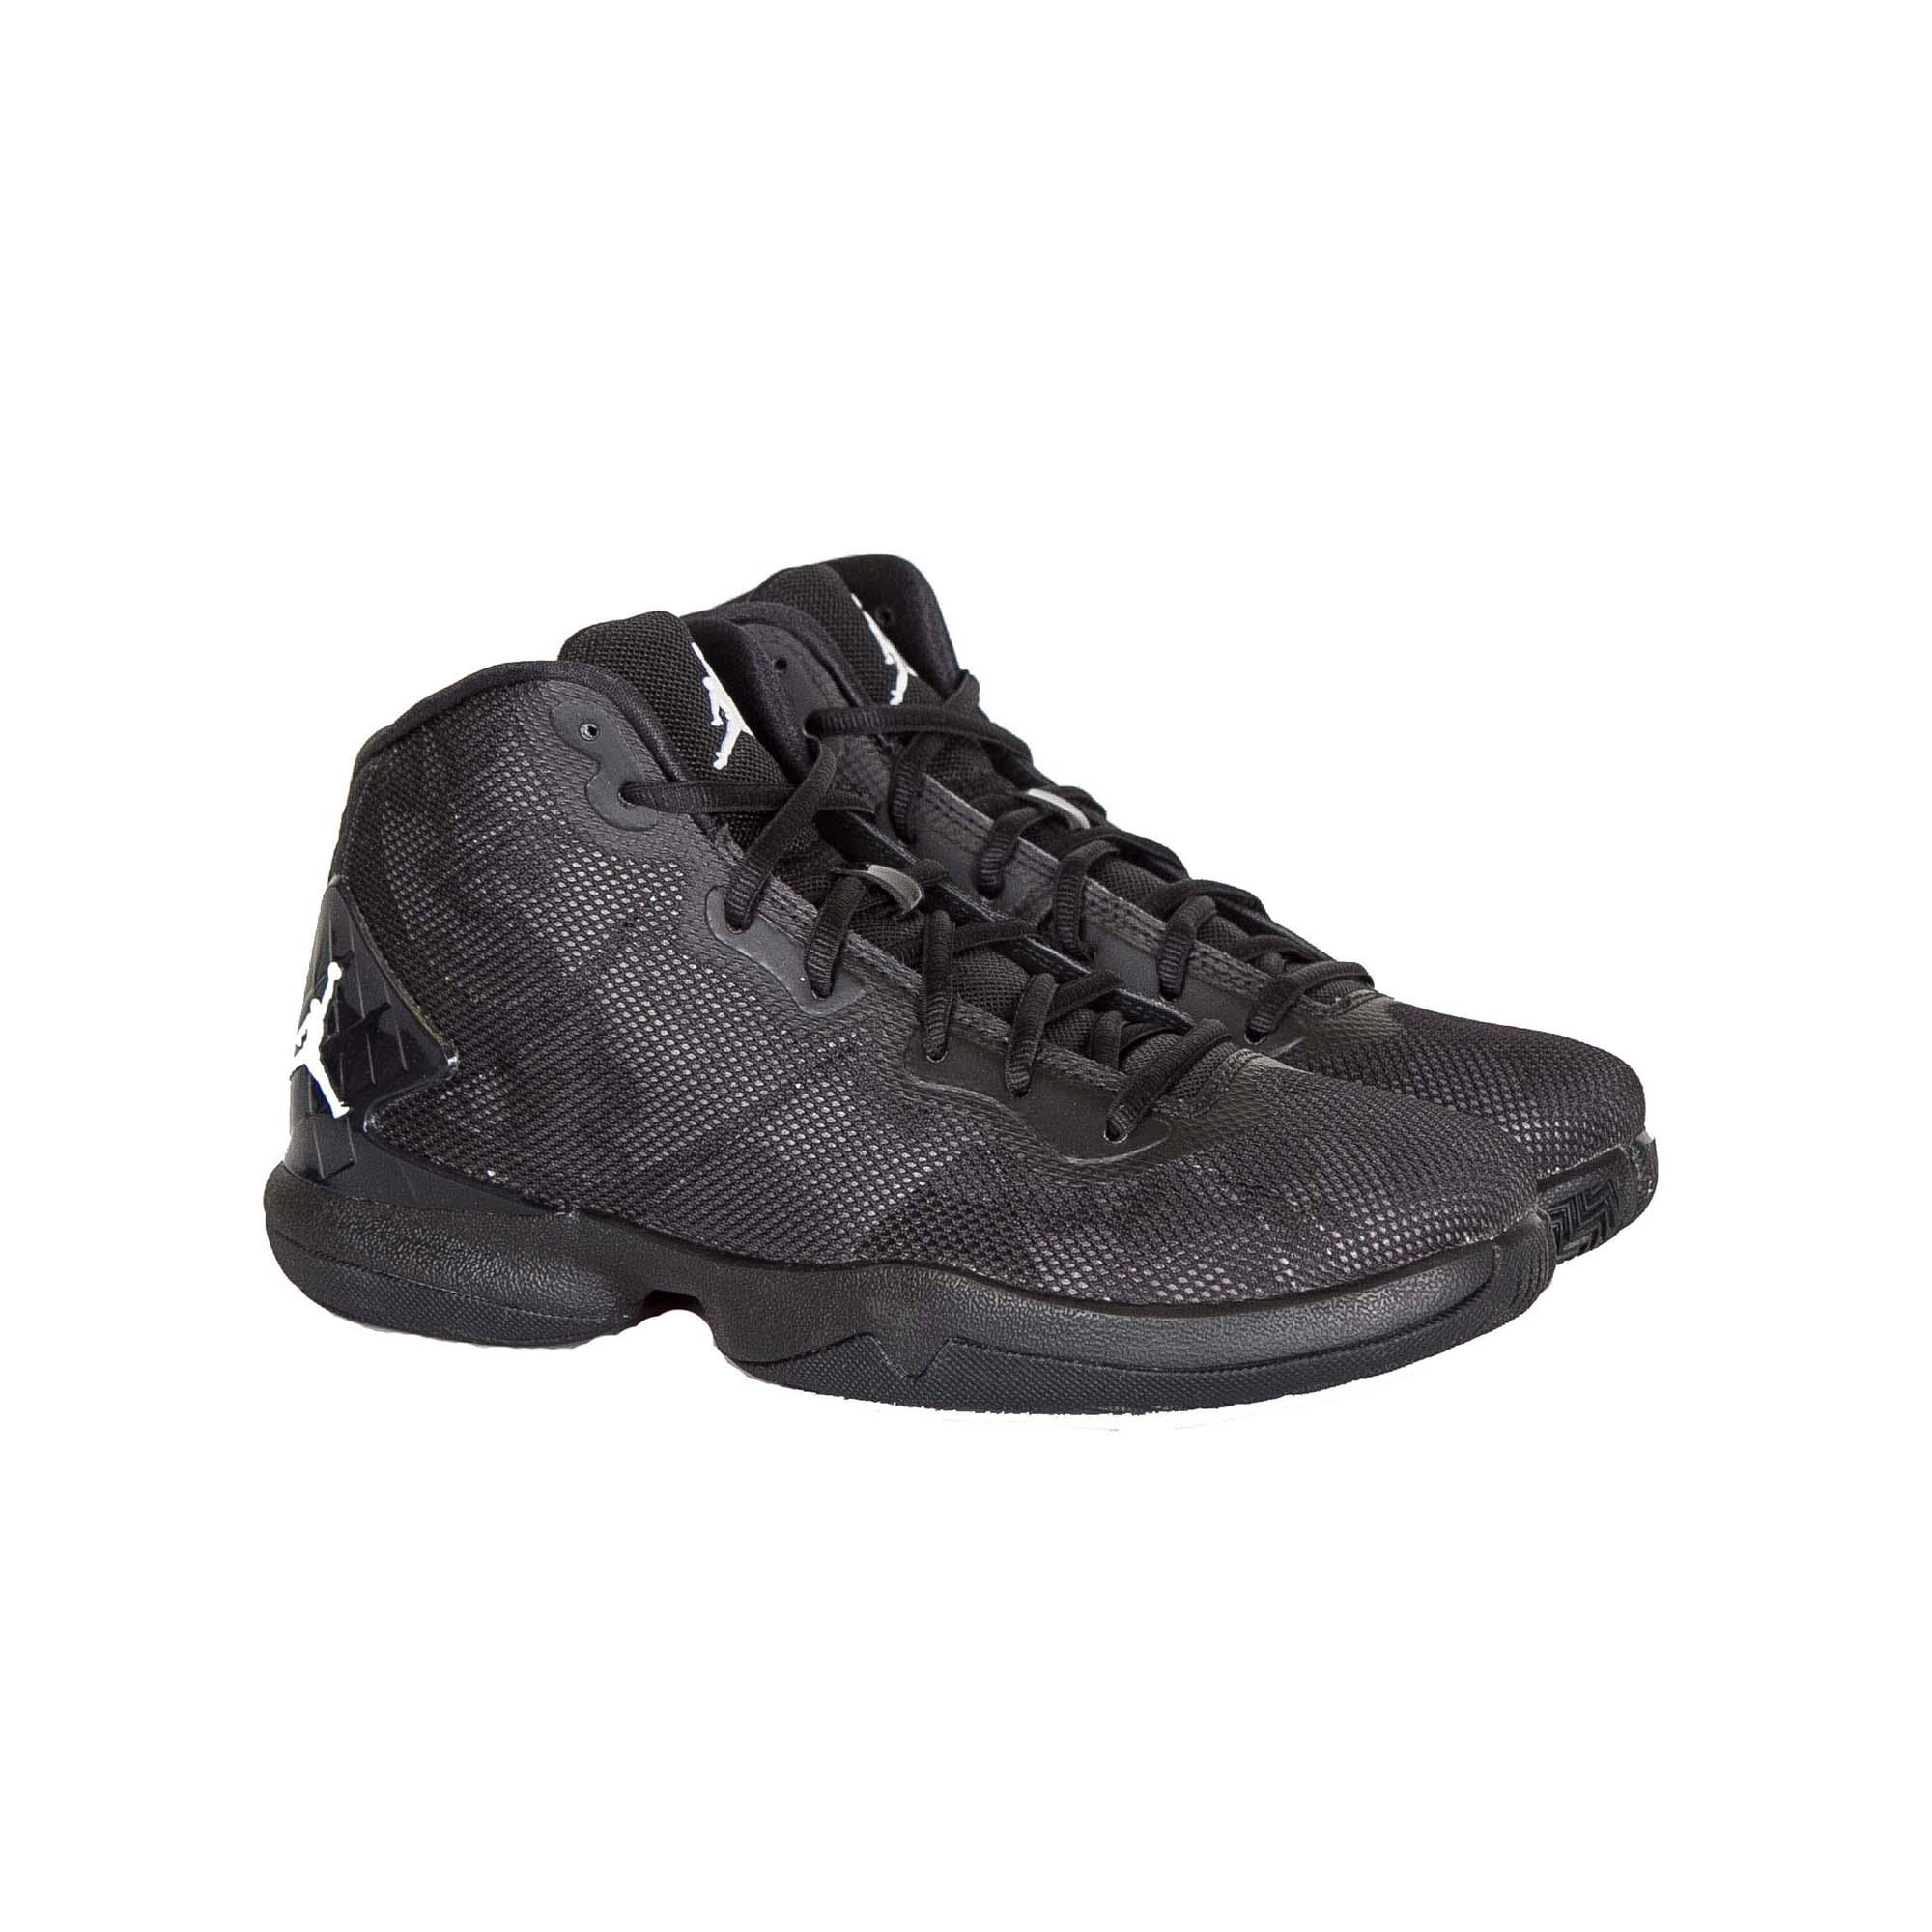 classic fit 3edd5 e5329 Details about Jordan Kids Nike Super Fly 4 Basketball Shoes-Black White Dark  Grey-7